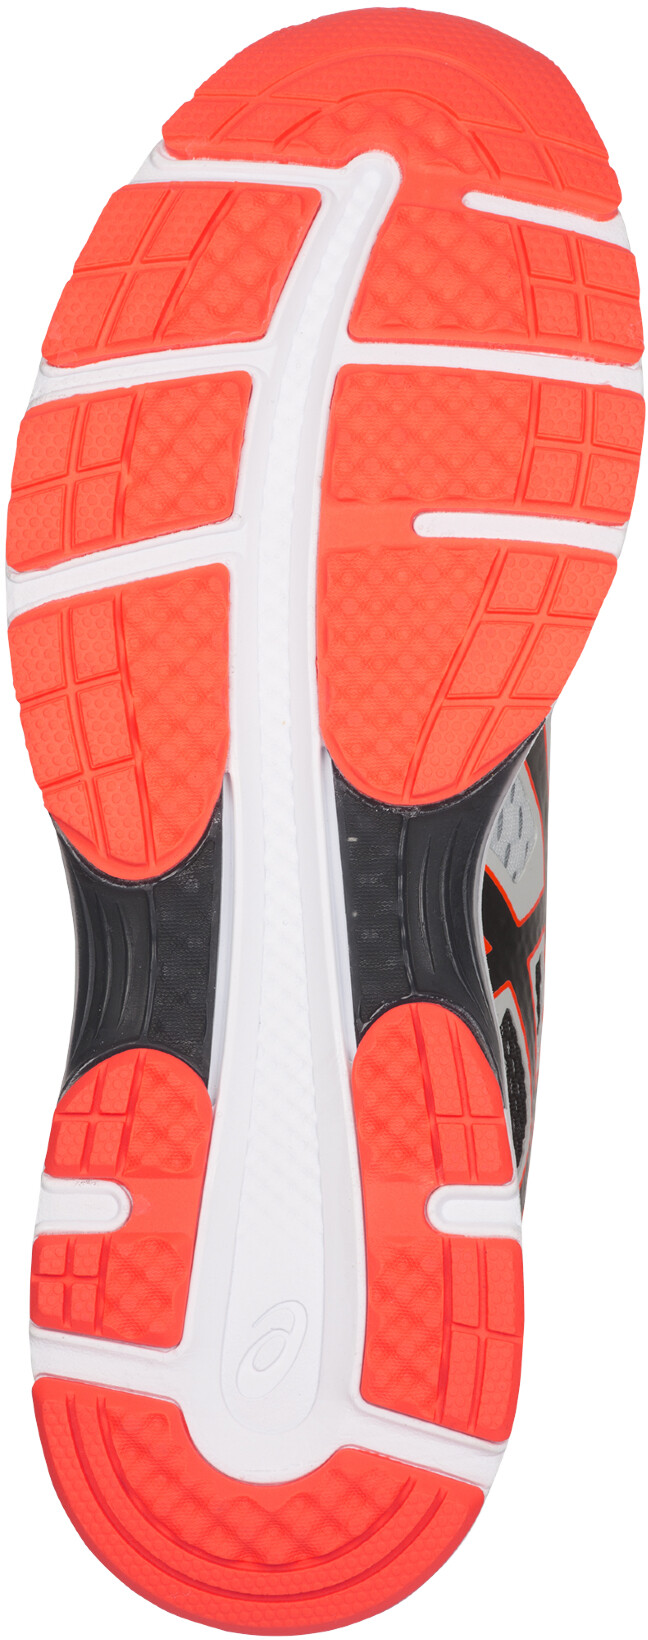 Homme Pulse Gel Chaussures Blancnoir Asics 10 Running X7wUqxnPFR